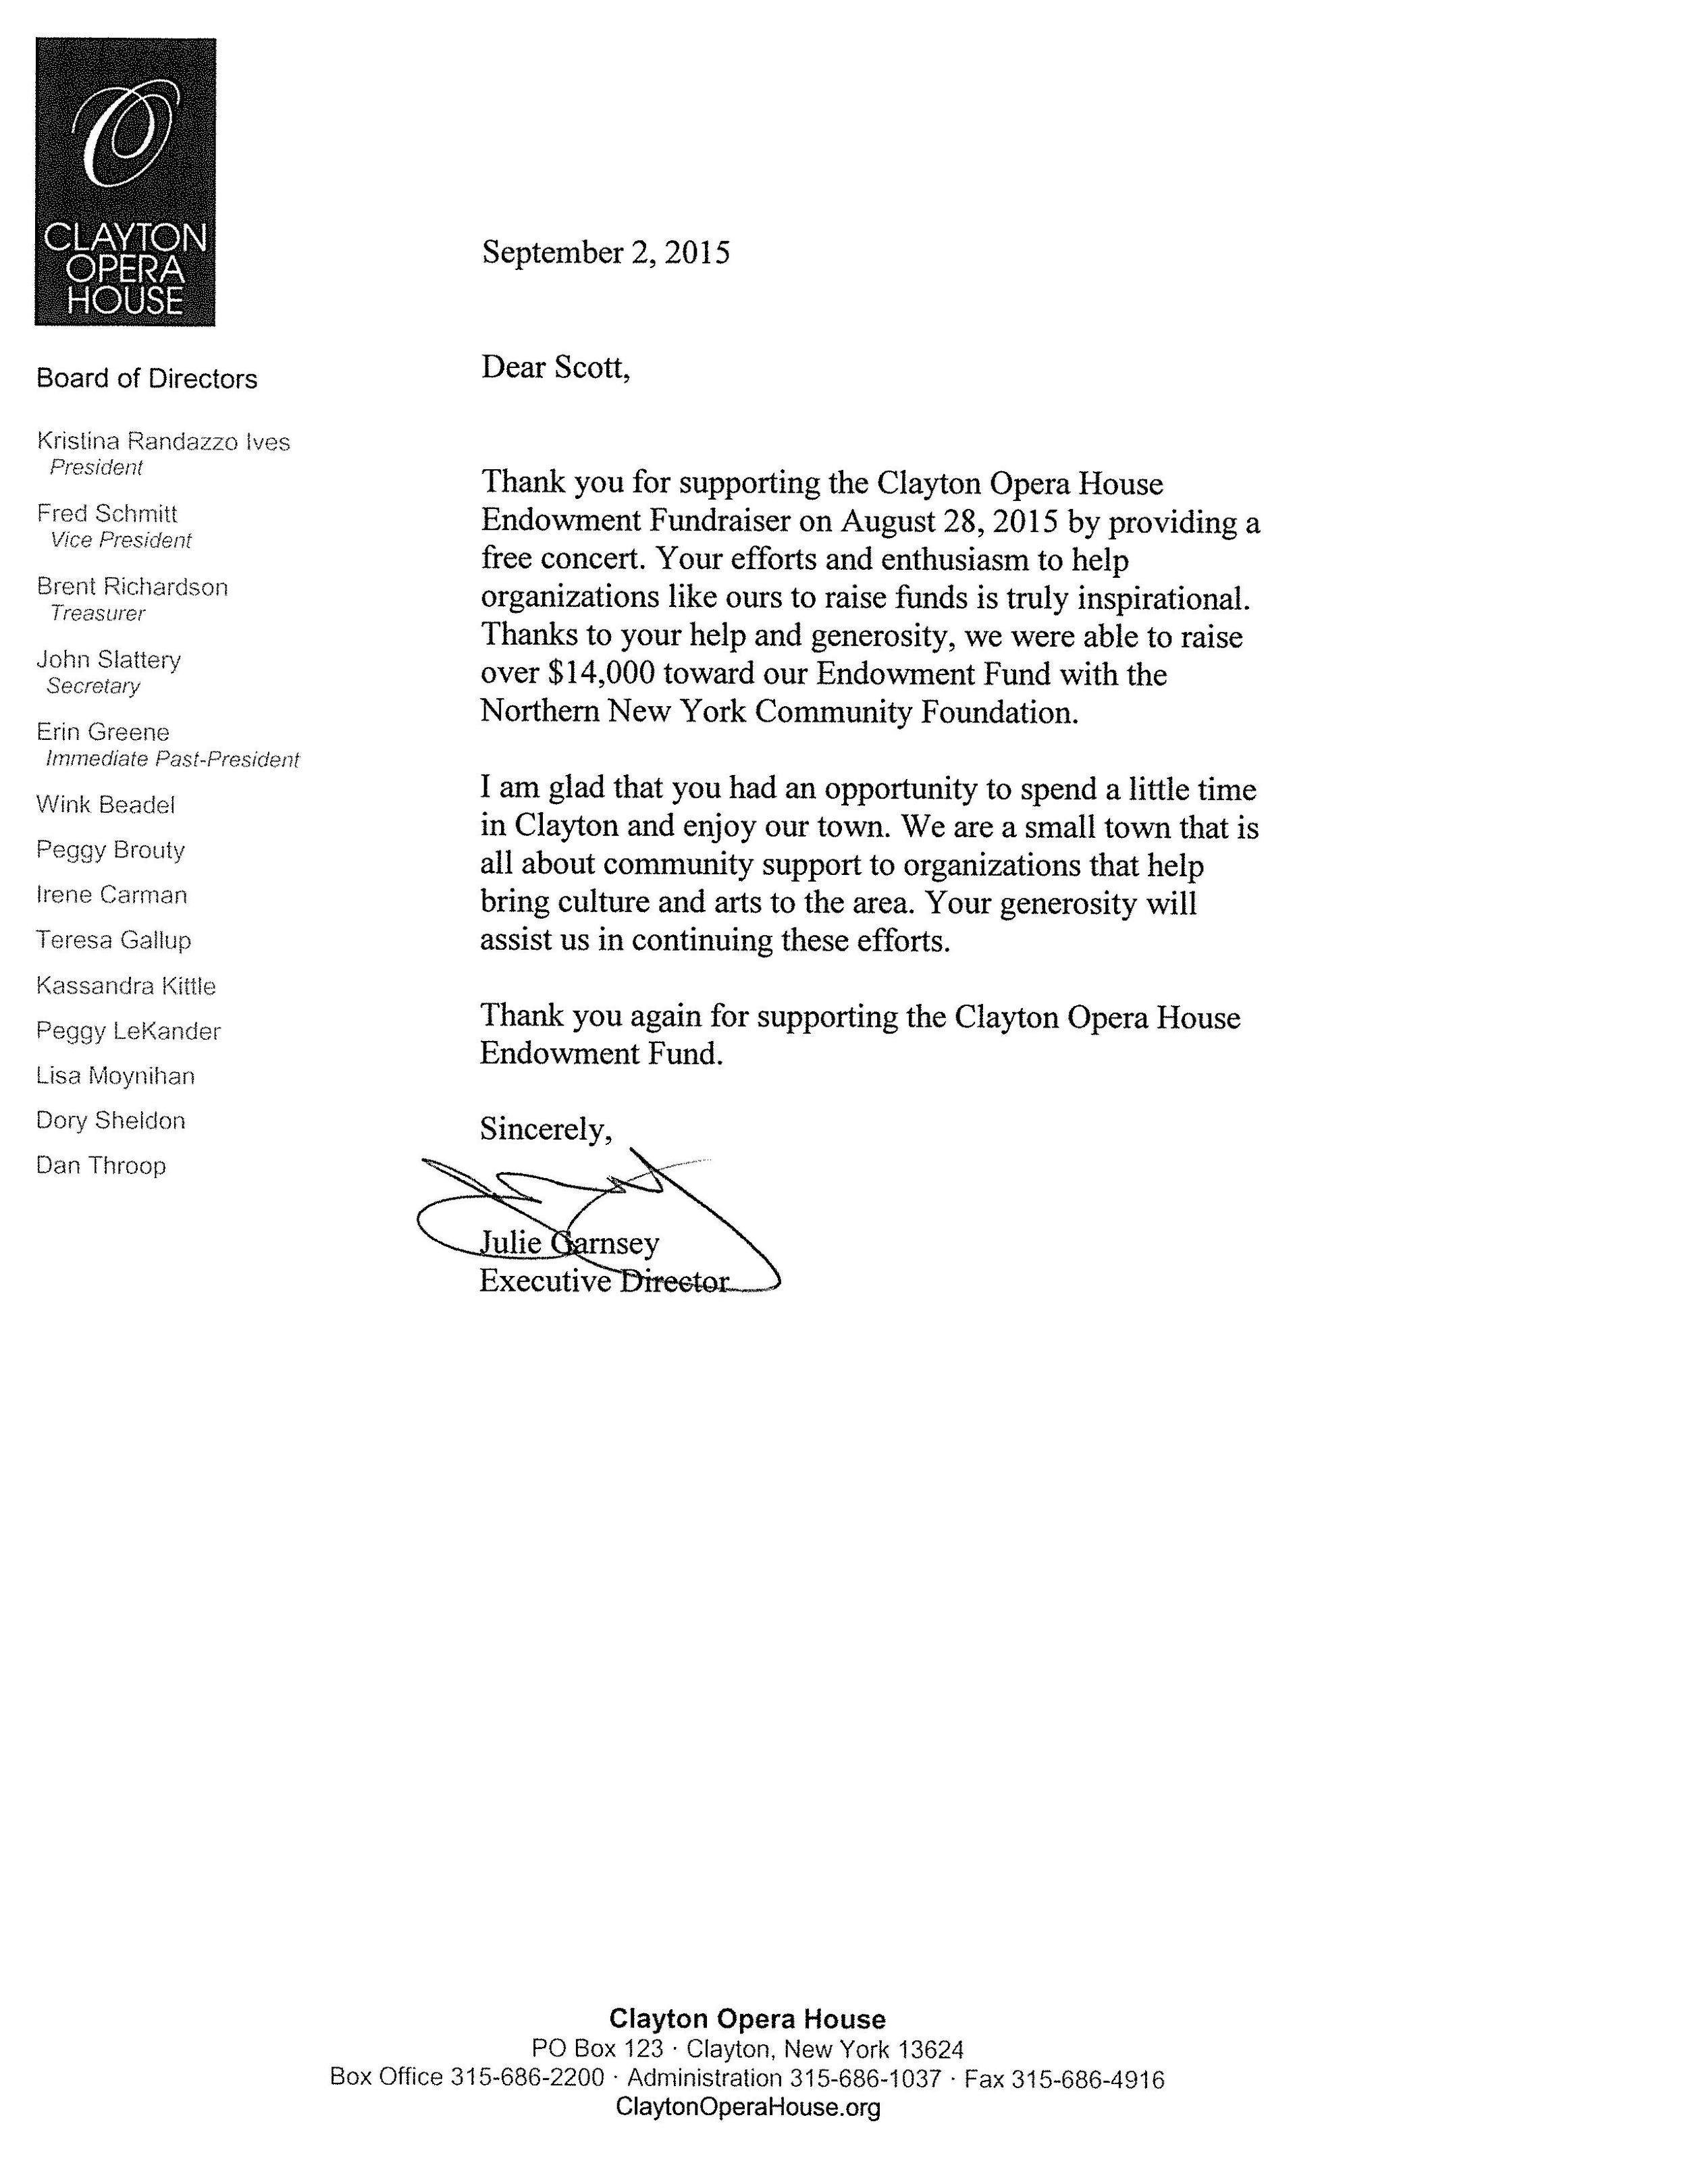 Clayton Opera House Testimonial for Scot Helmer